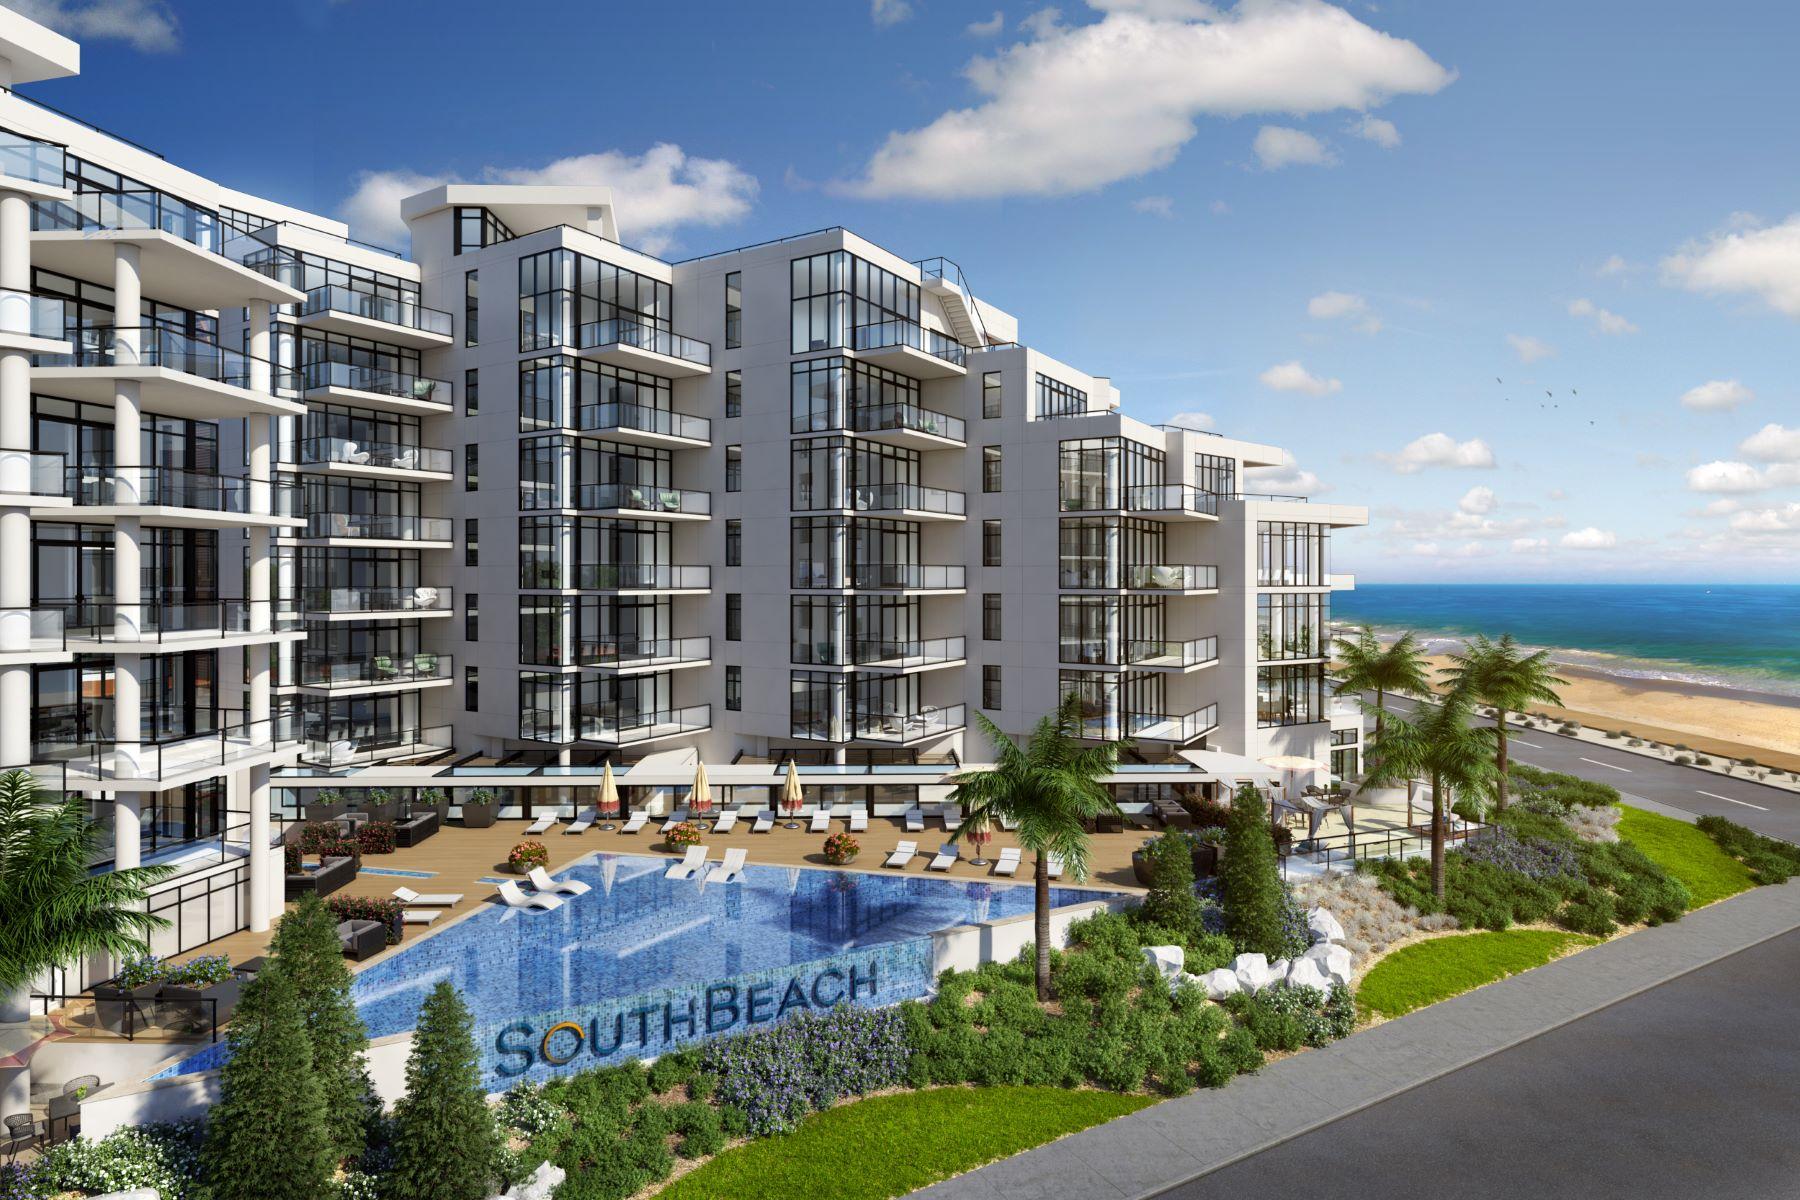 Condominiums 용 매매 에 South Beach at Long Branch 350 Ocean Avenue 405, Long Branch, 뉴저지 07740 미국